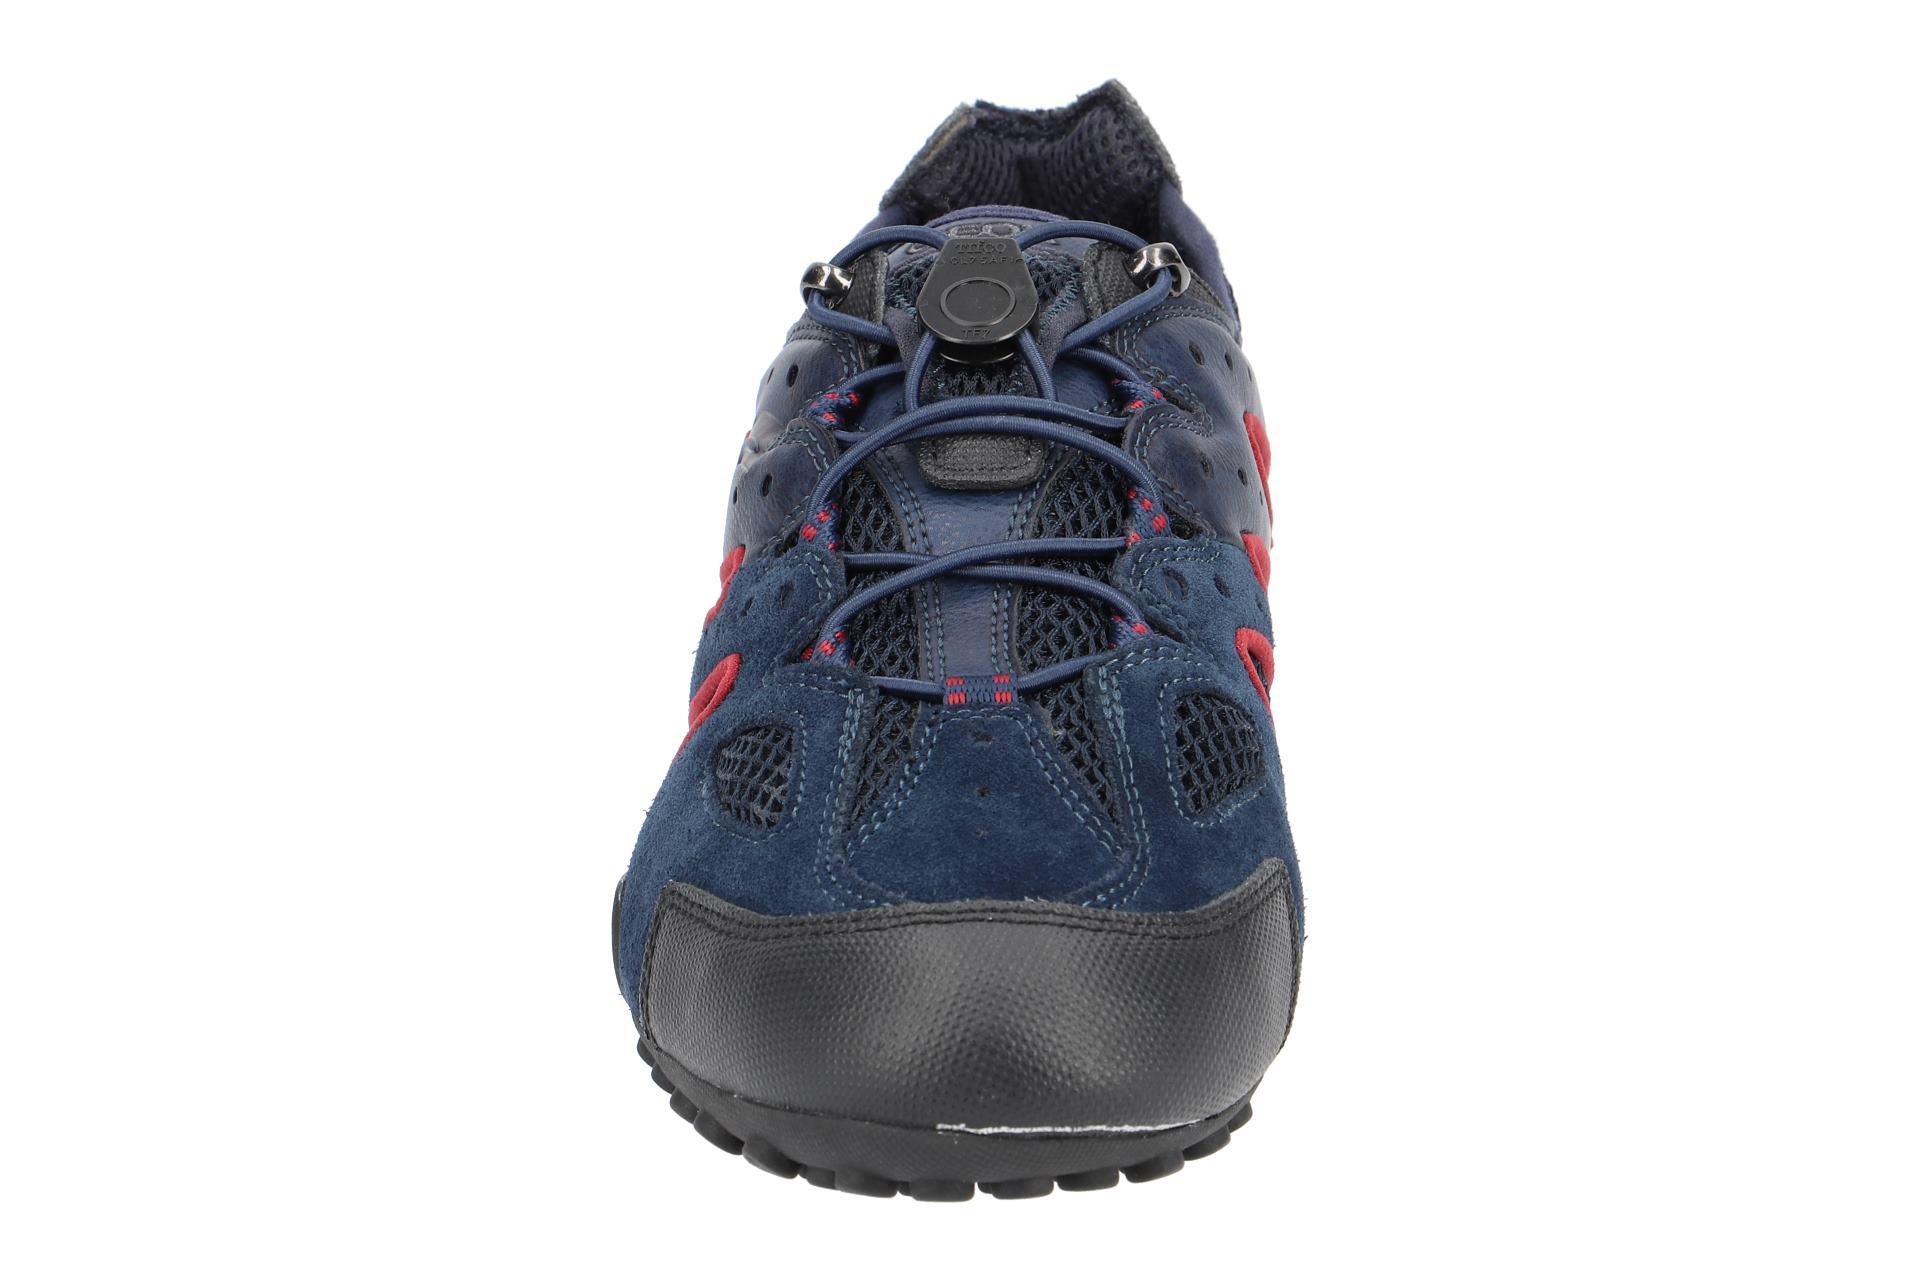 Geox Schuhe SNAKE blau Herrenschuhe Sneakers U4207J 02214 C4E7W NEU | eBay